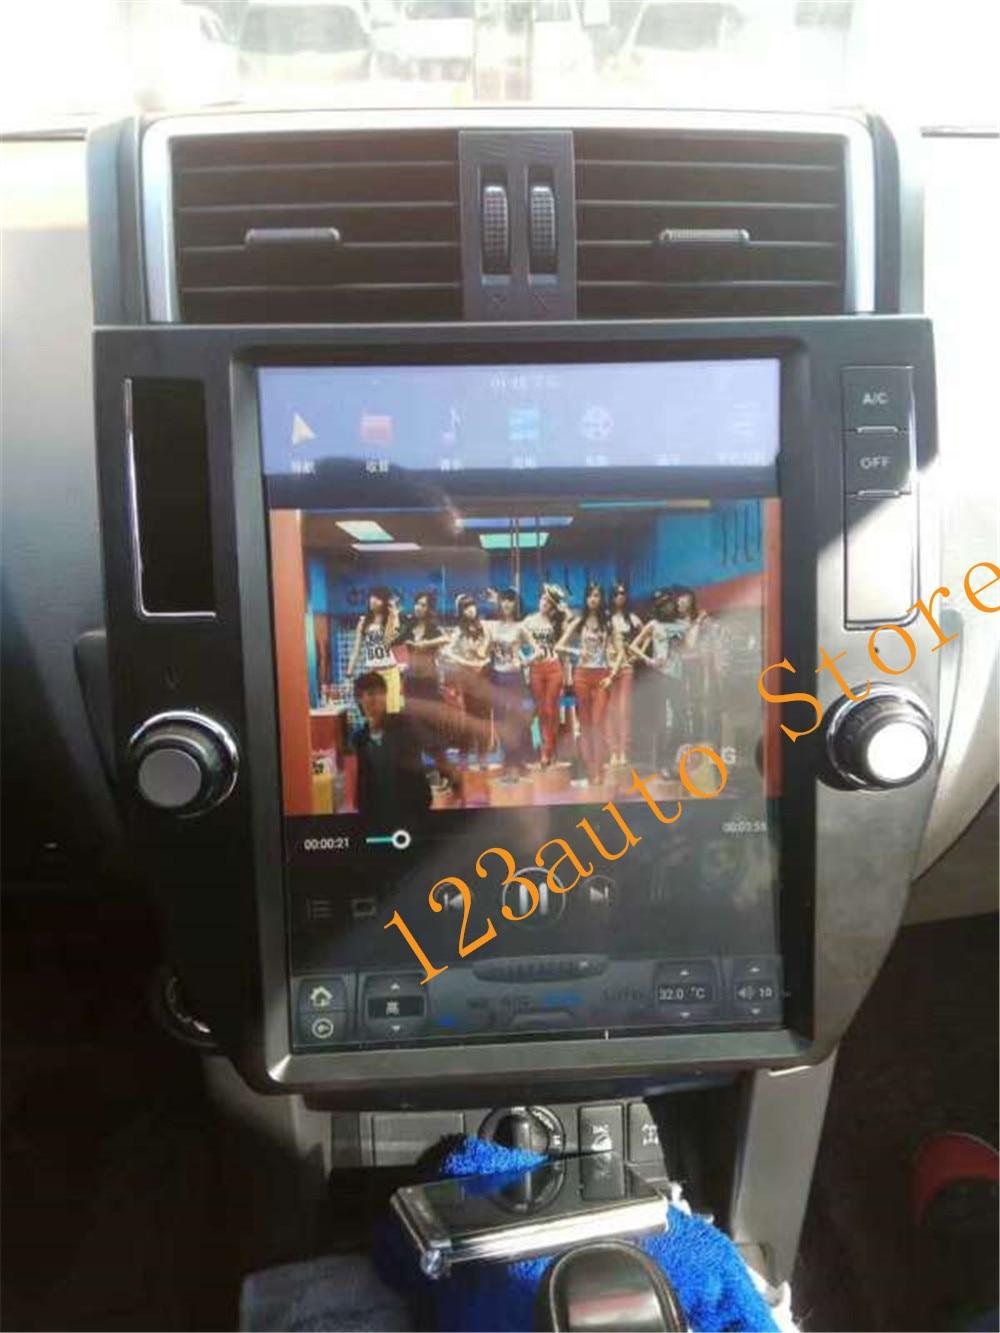 Autocardvdgps 12.1 inch vertical tesla style android 7.1 auto car dvd gps player for  toyota land cruiser prado 150 2010 2011 2012 2013 radio